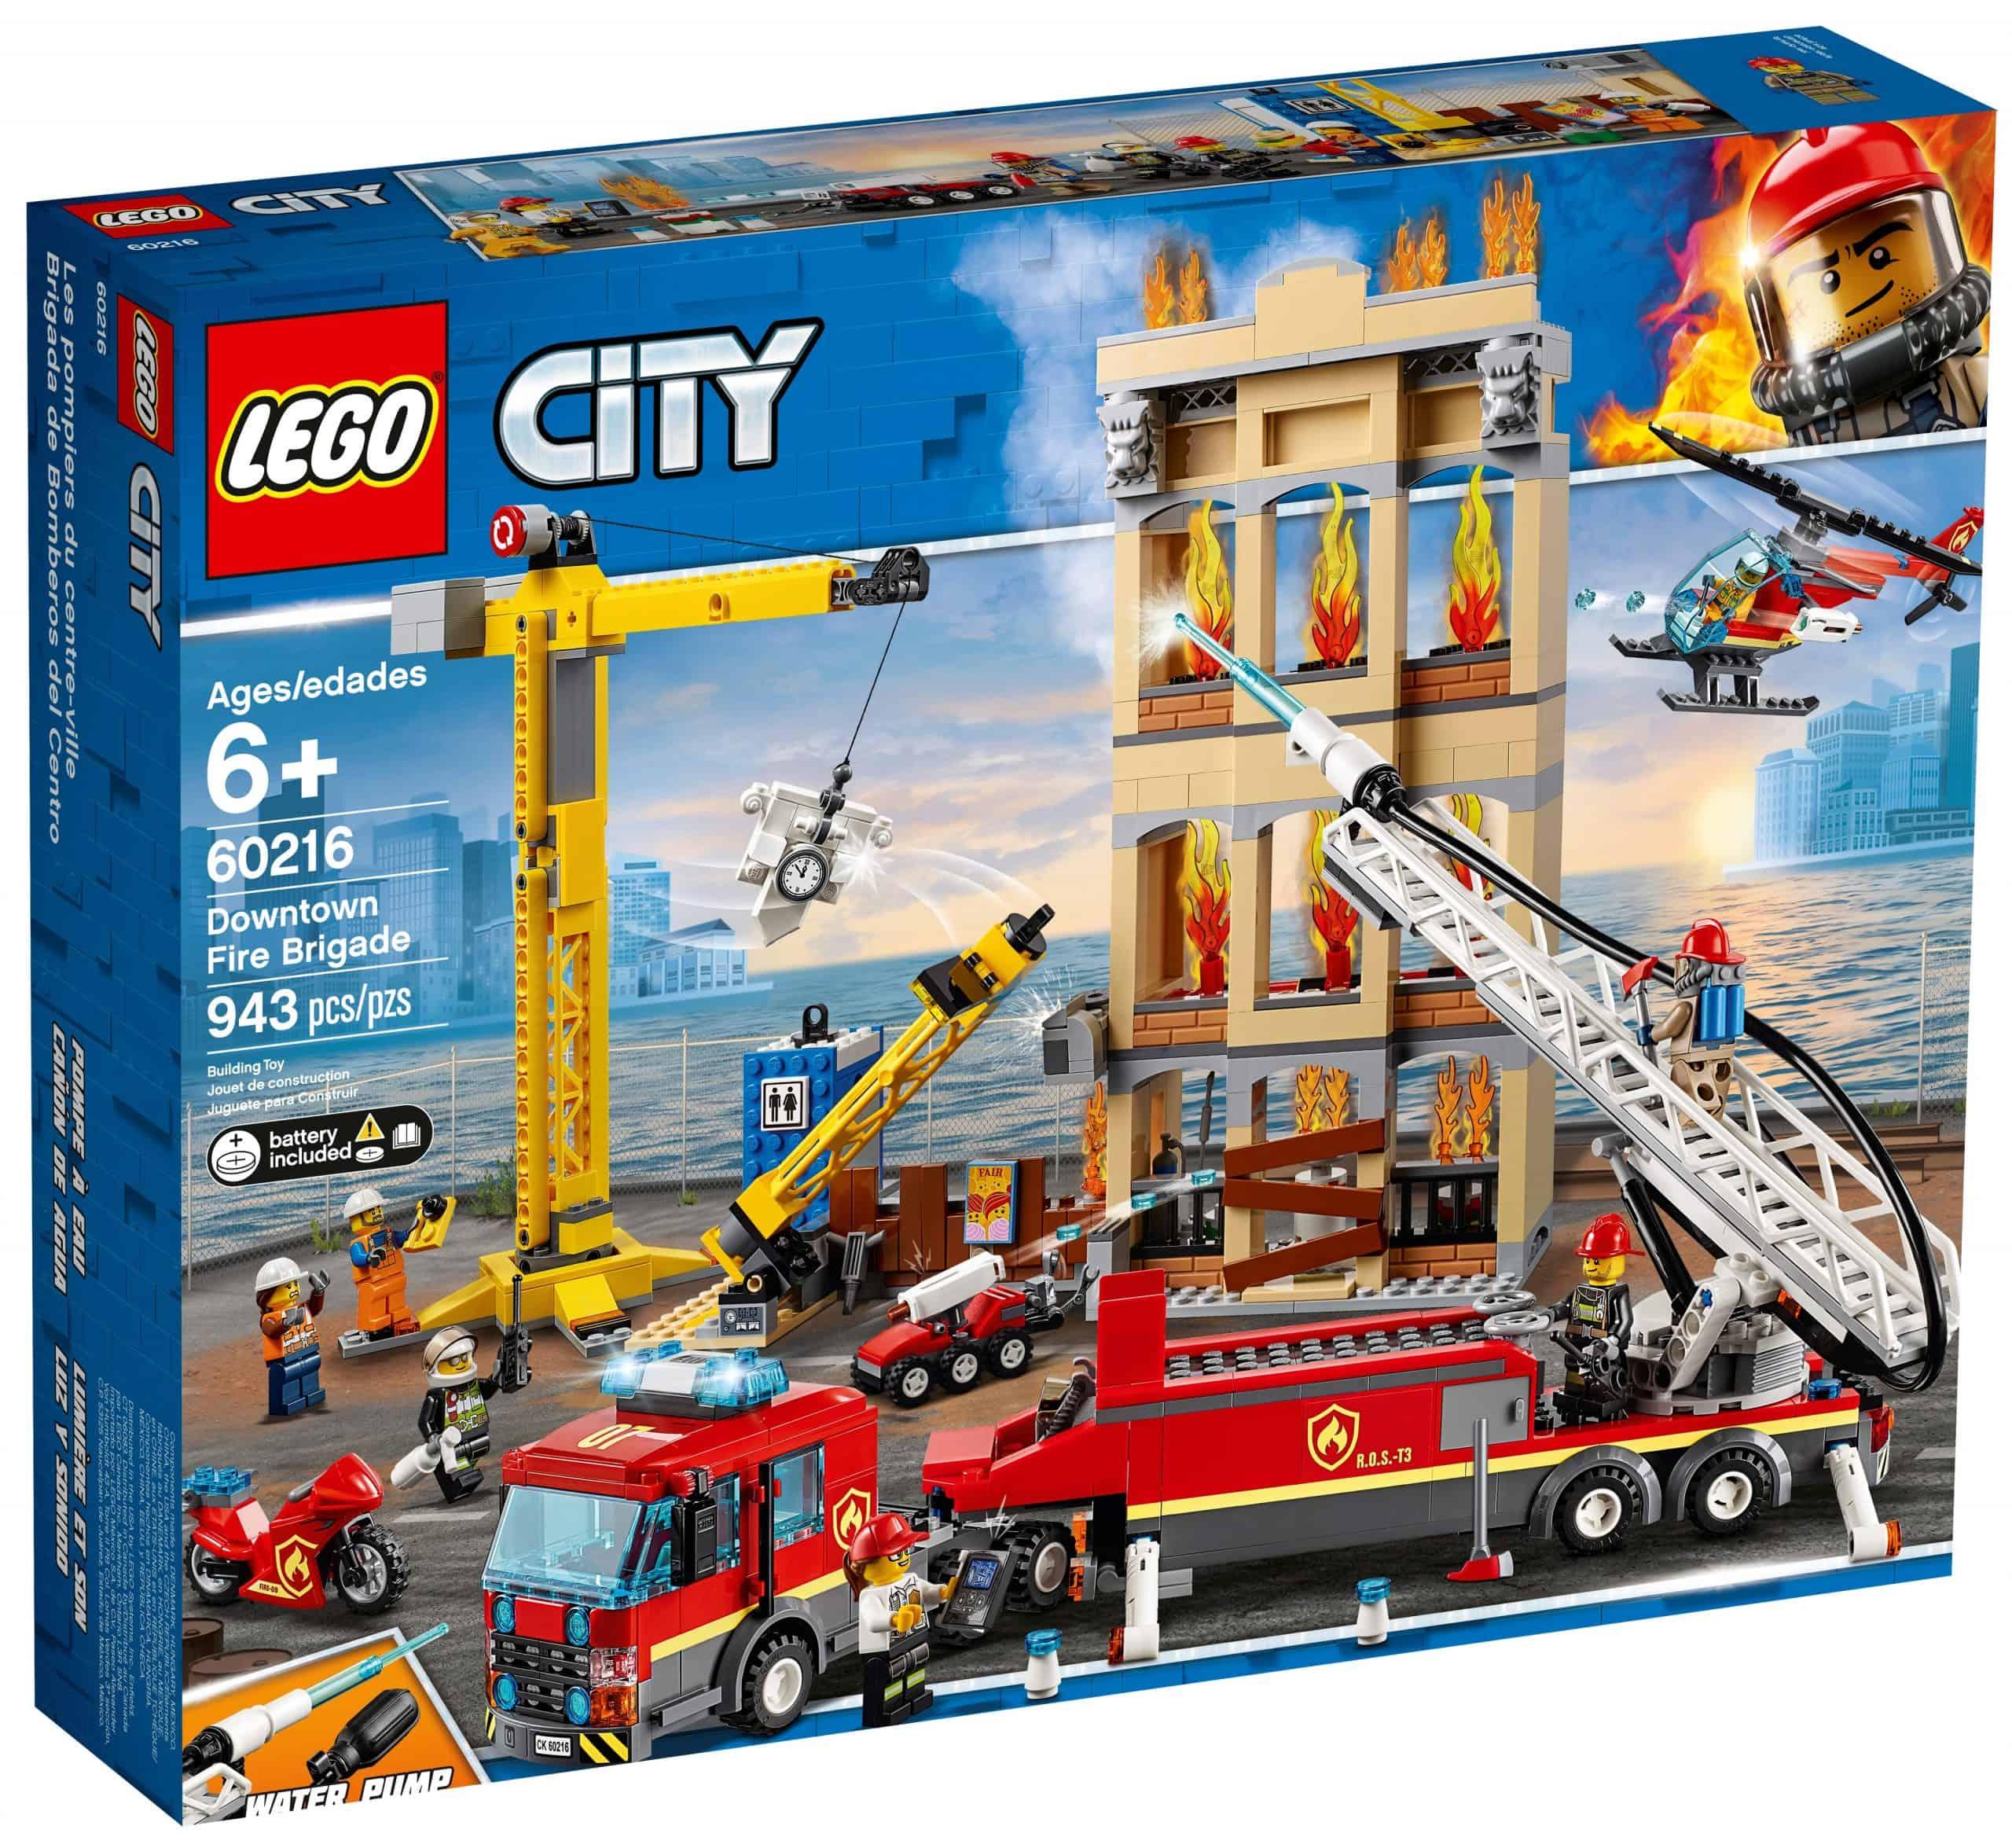 lego 60216 midtbyens brandvaesen scaled